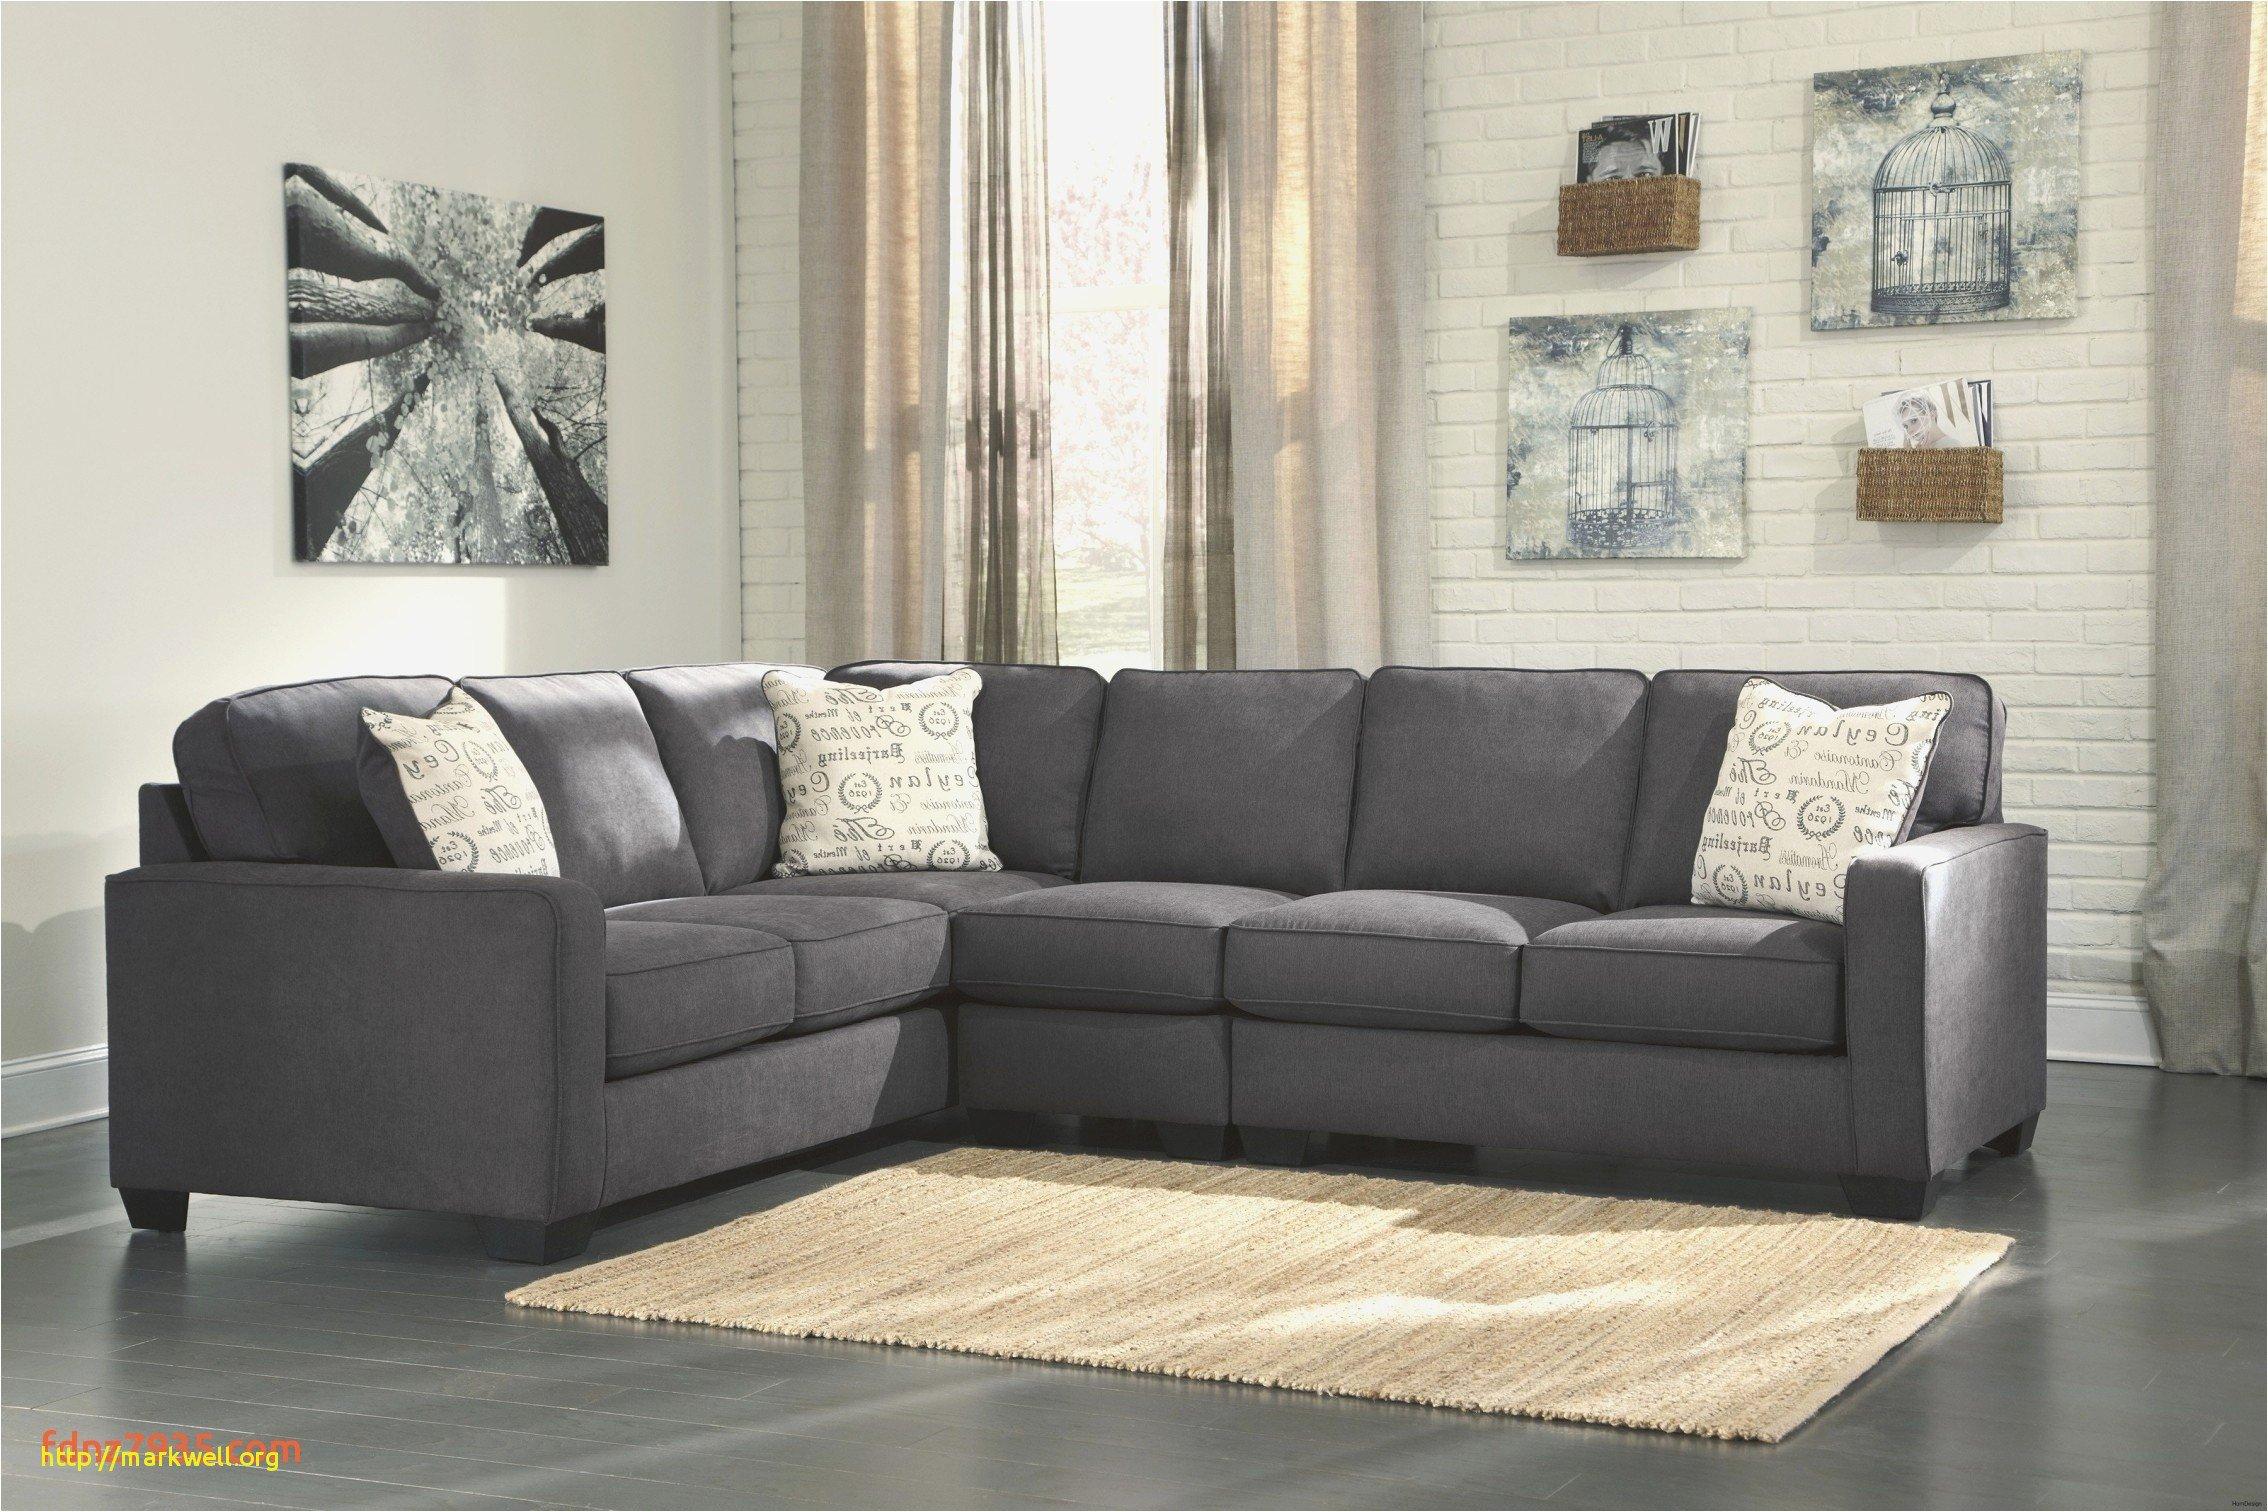 Bob Discount Furniture Bedroom Set Unique Awesome Bobs Living Room Furniture